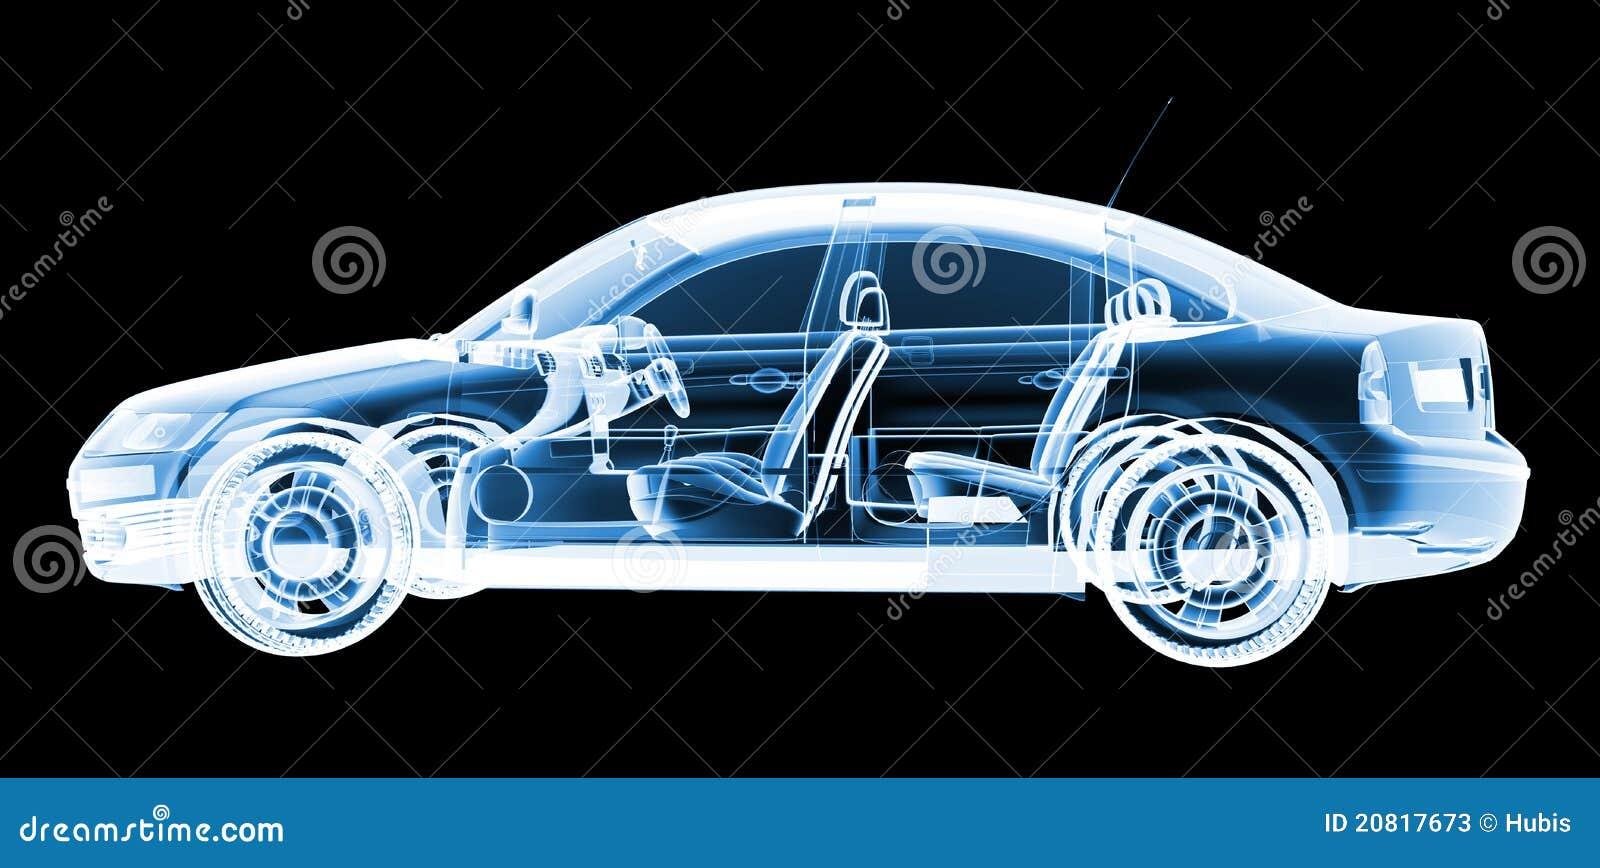 Auto Design Tech: Tech Xray Car Design Stock Illustration. Illustration Of